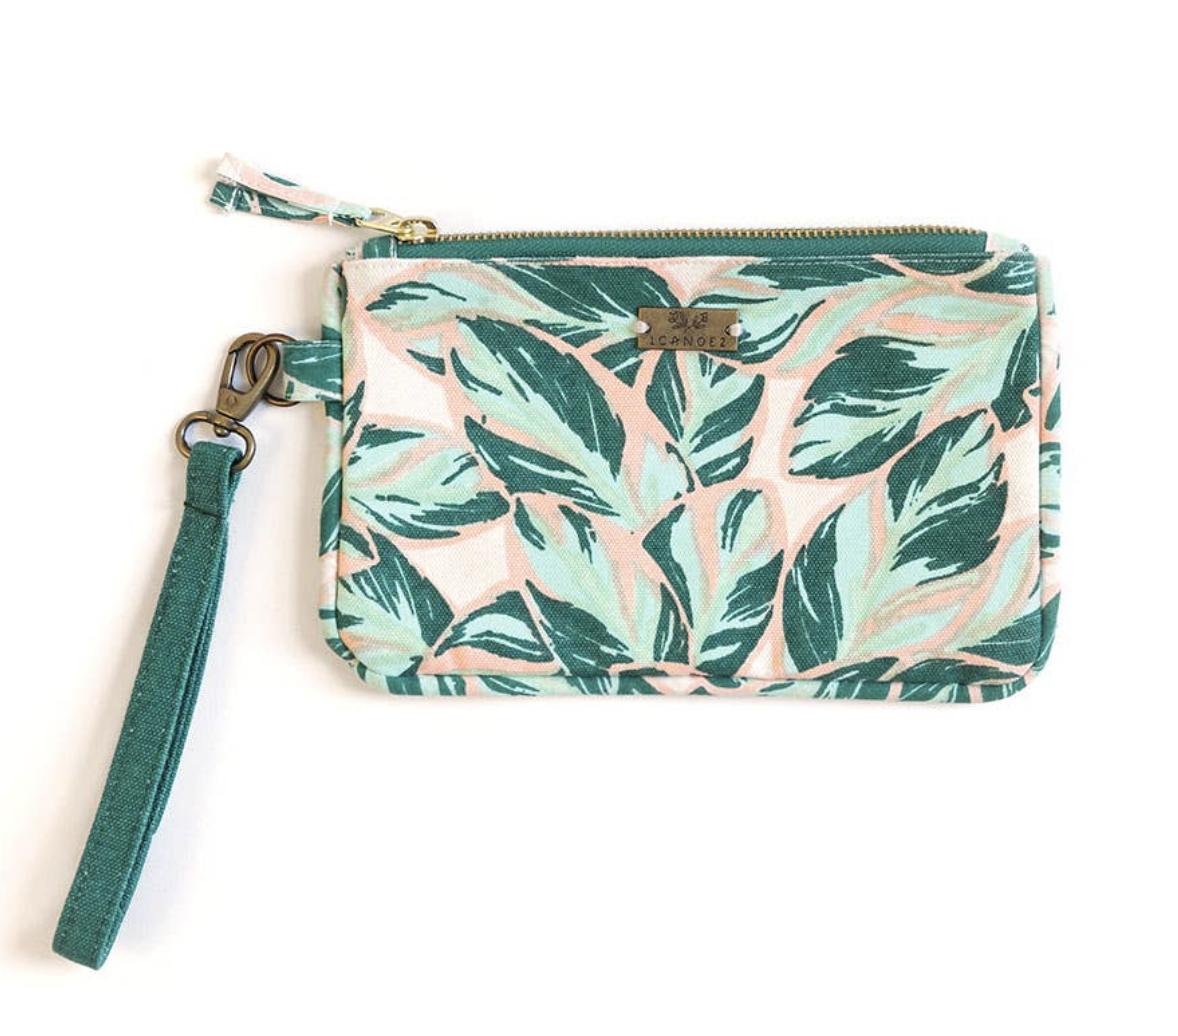 Highland Floral Zippered Clutch Bag